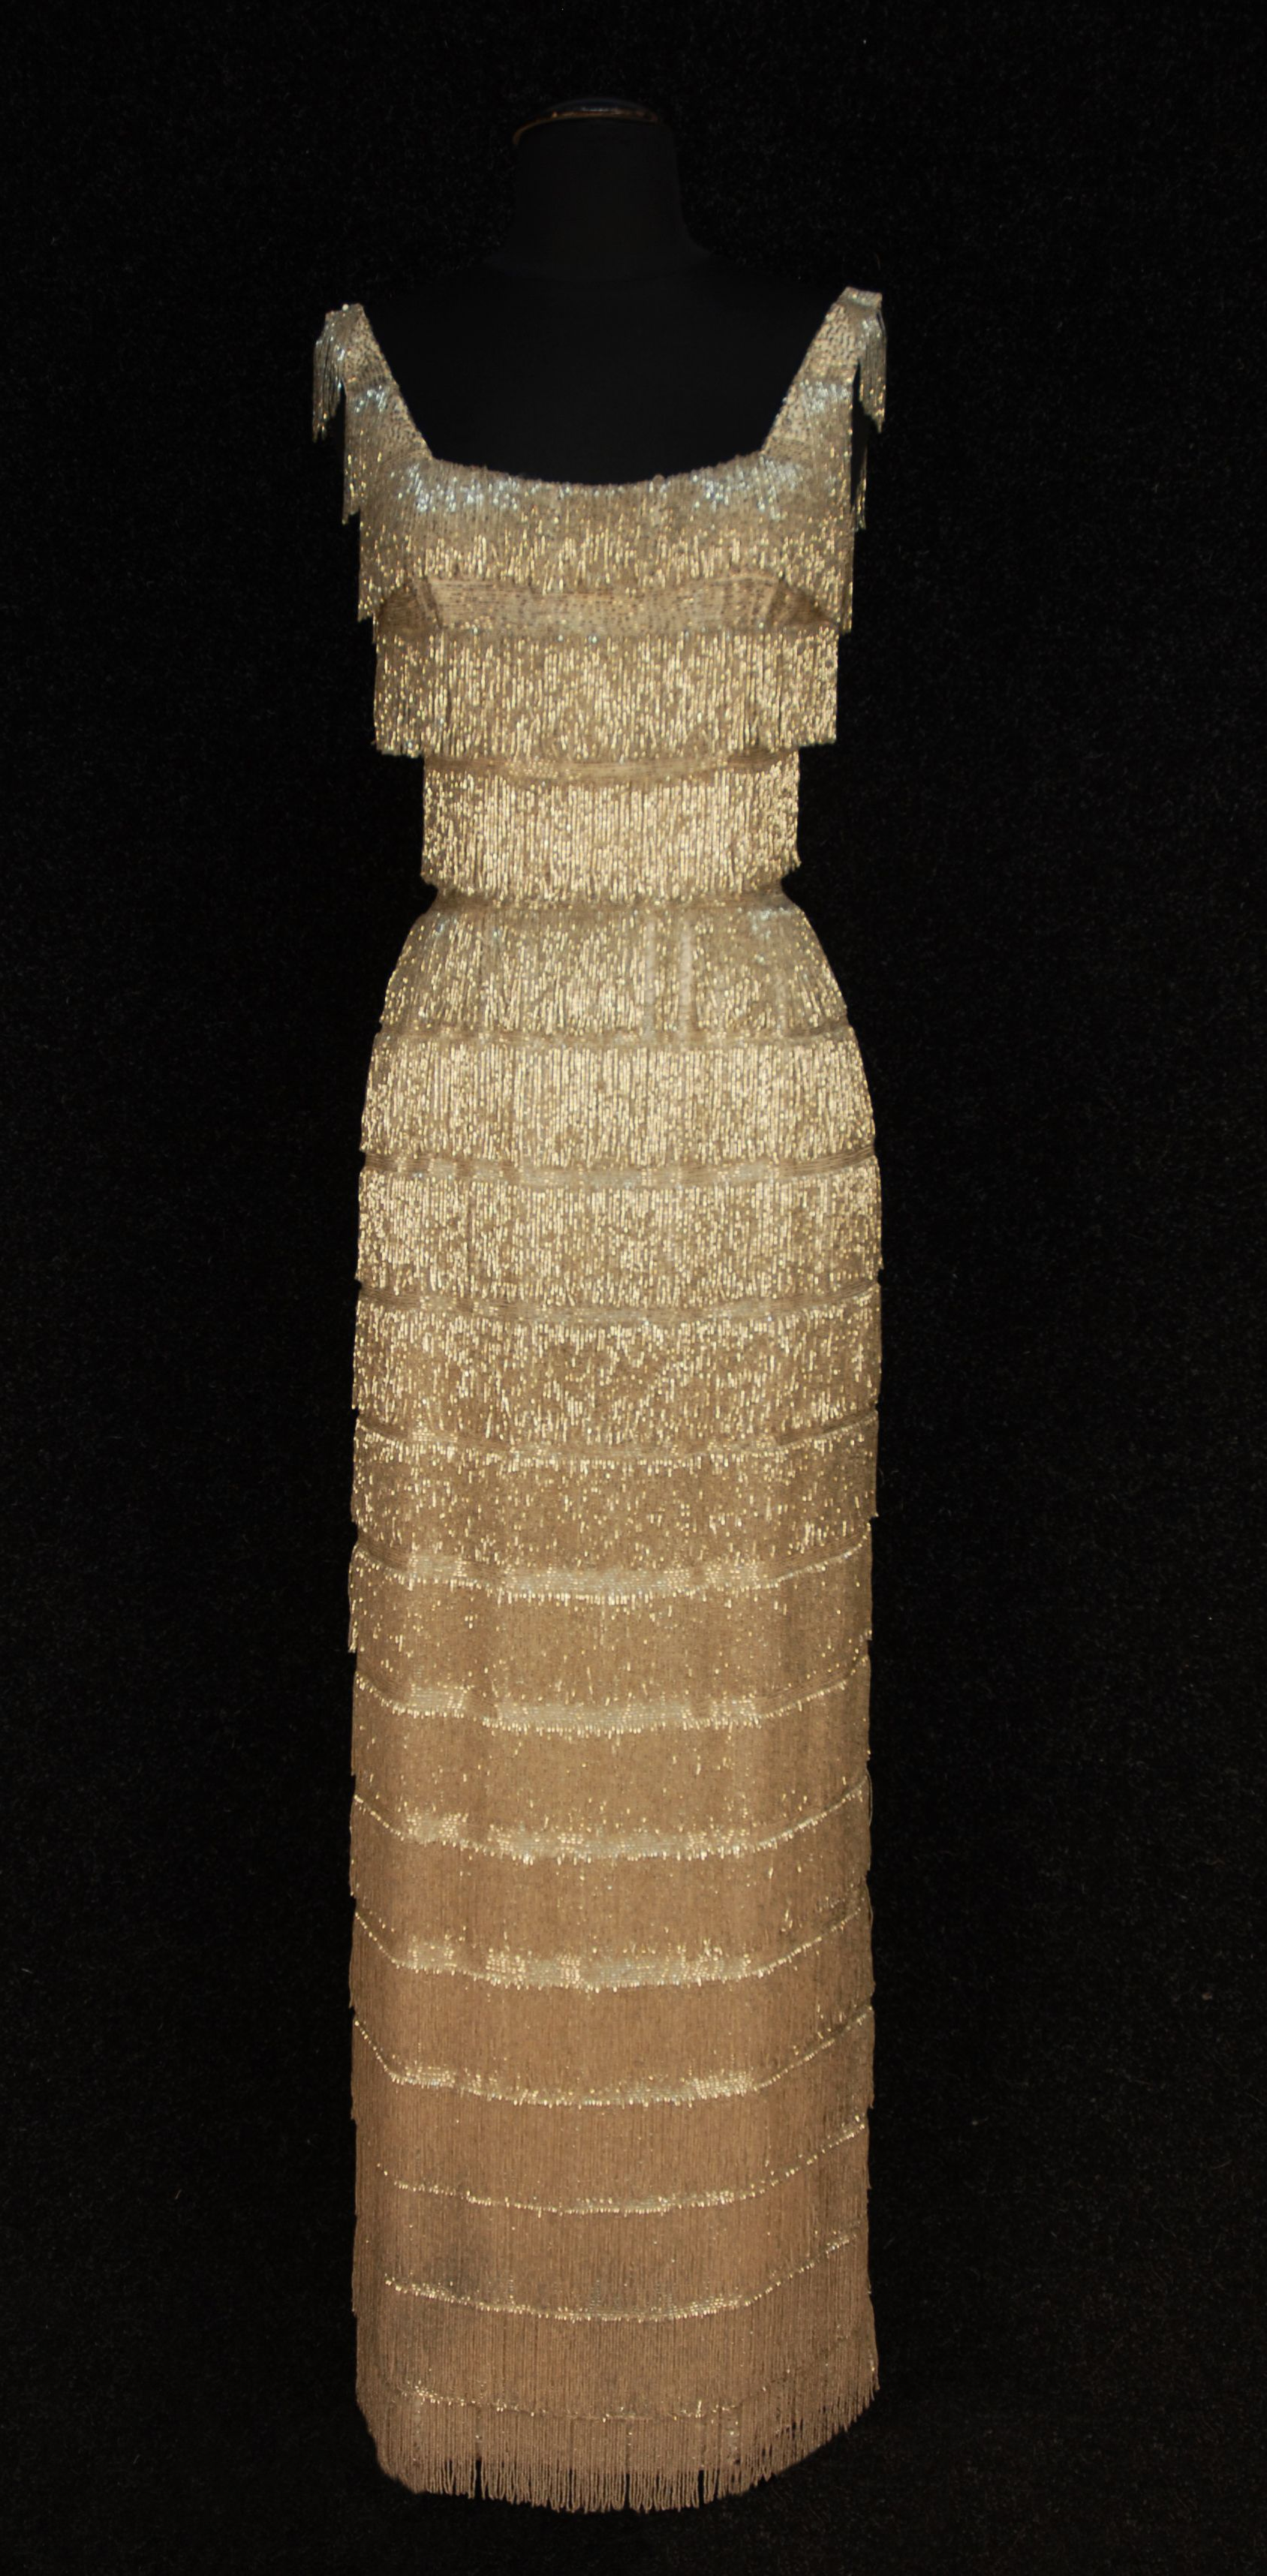 Lot 1194 Whitakerauction Vintage Fashion 1960s Vintage Gowns Fashion [ 3432 x 1688 Pixel ]